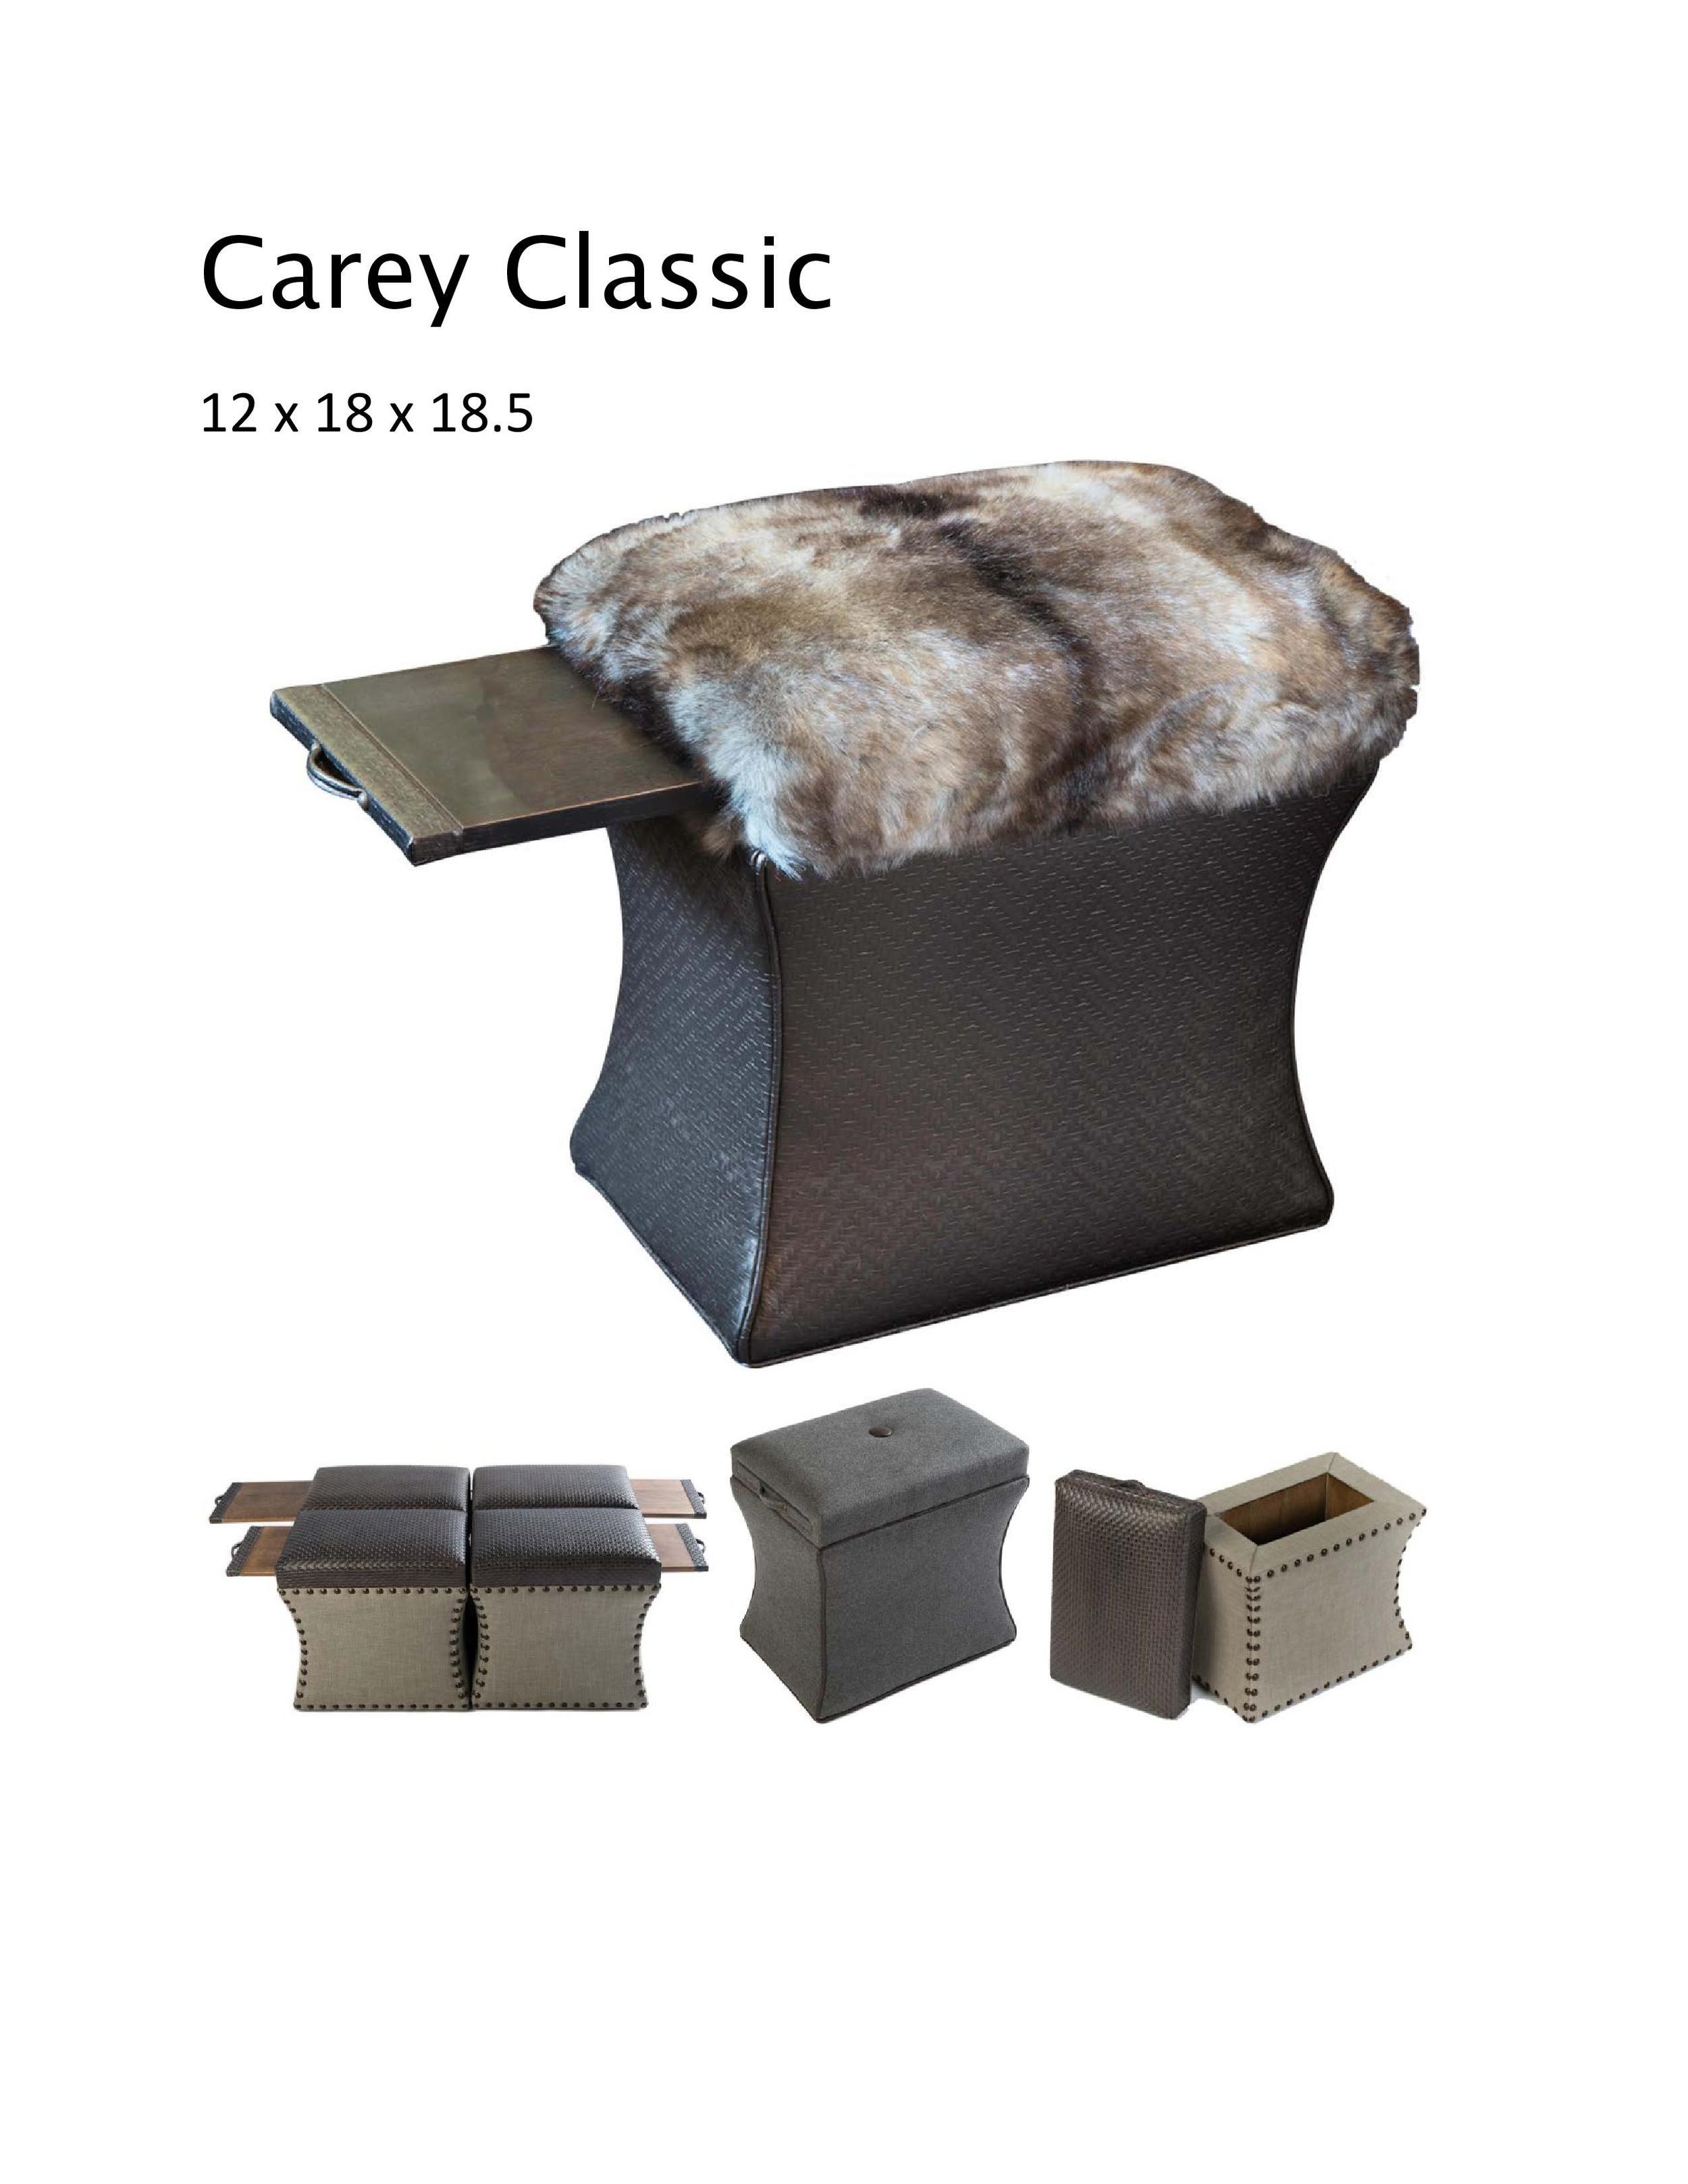 Carey classic-page-001.jpg